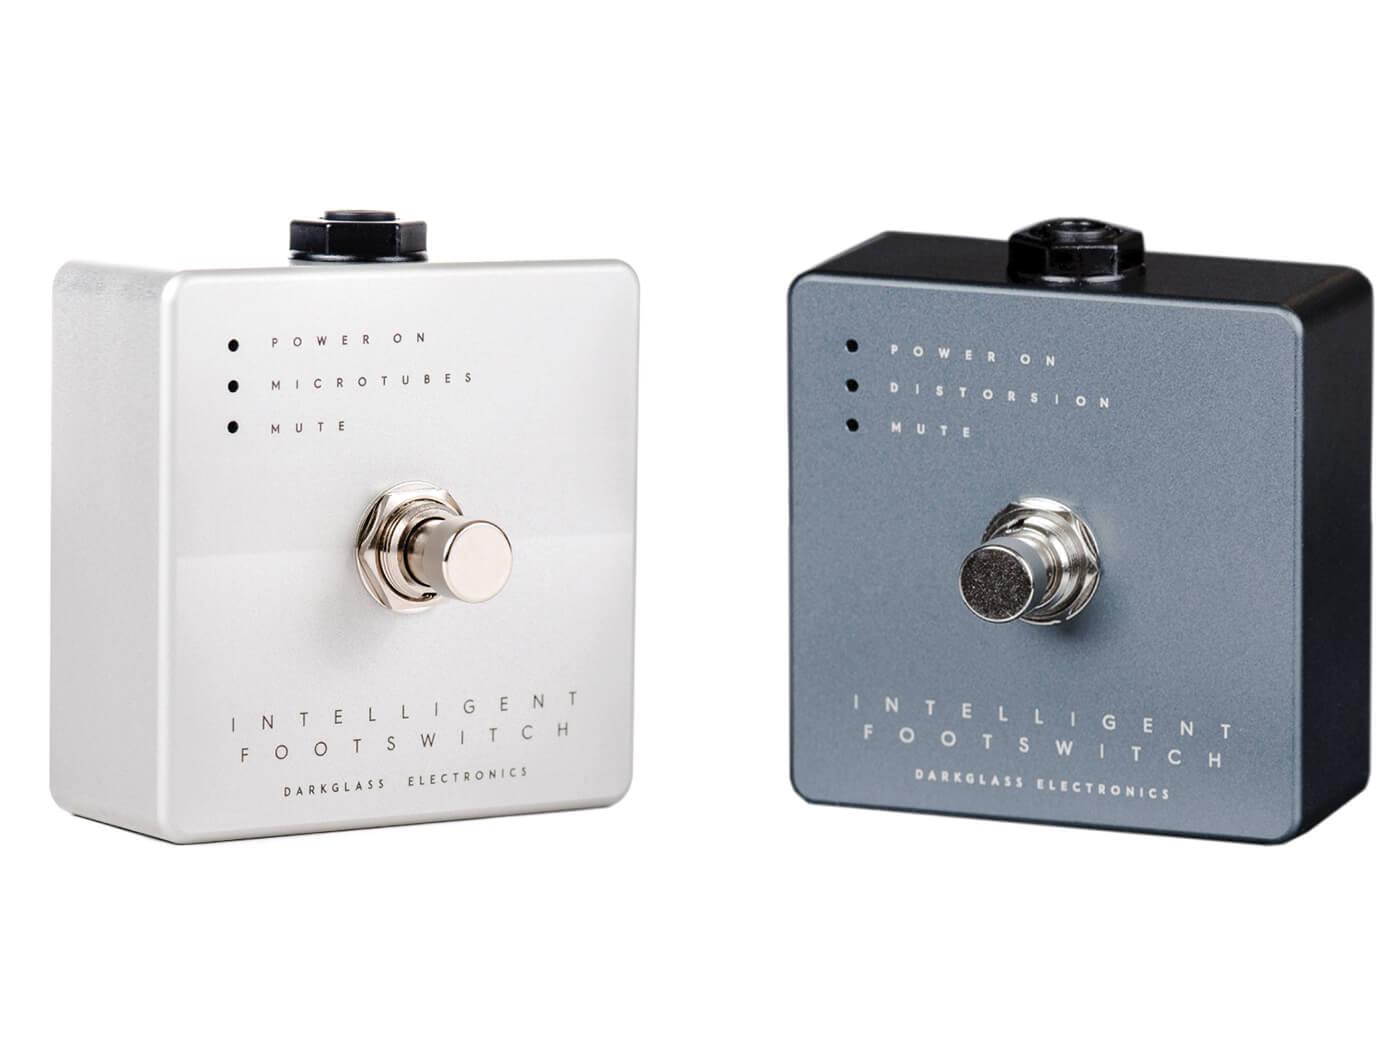 Darkglass Electronics Intelligent footswitch